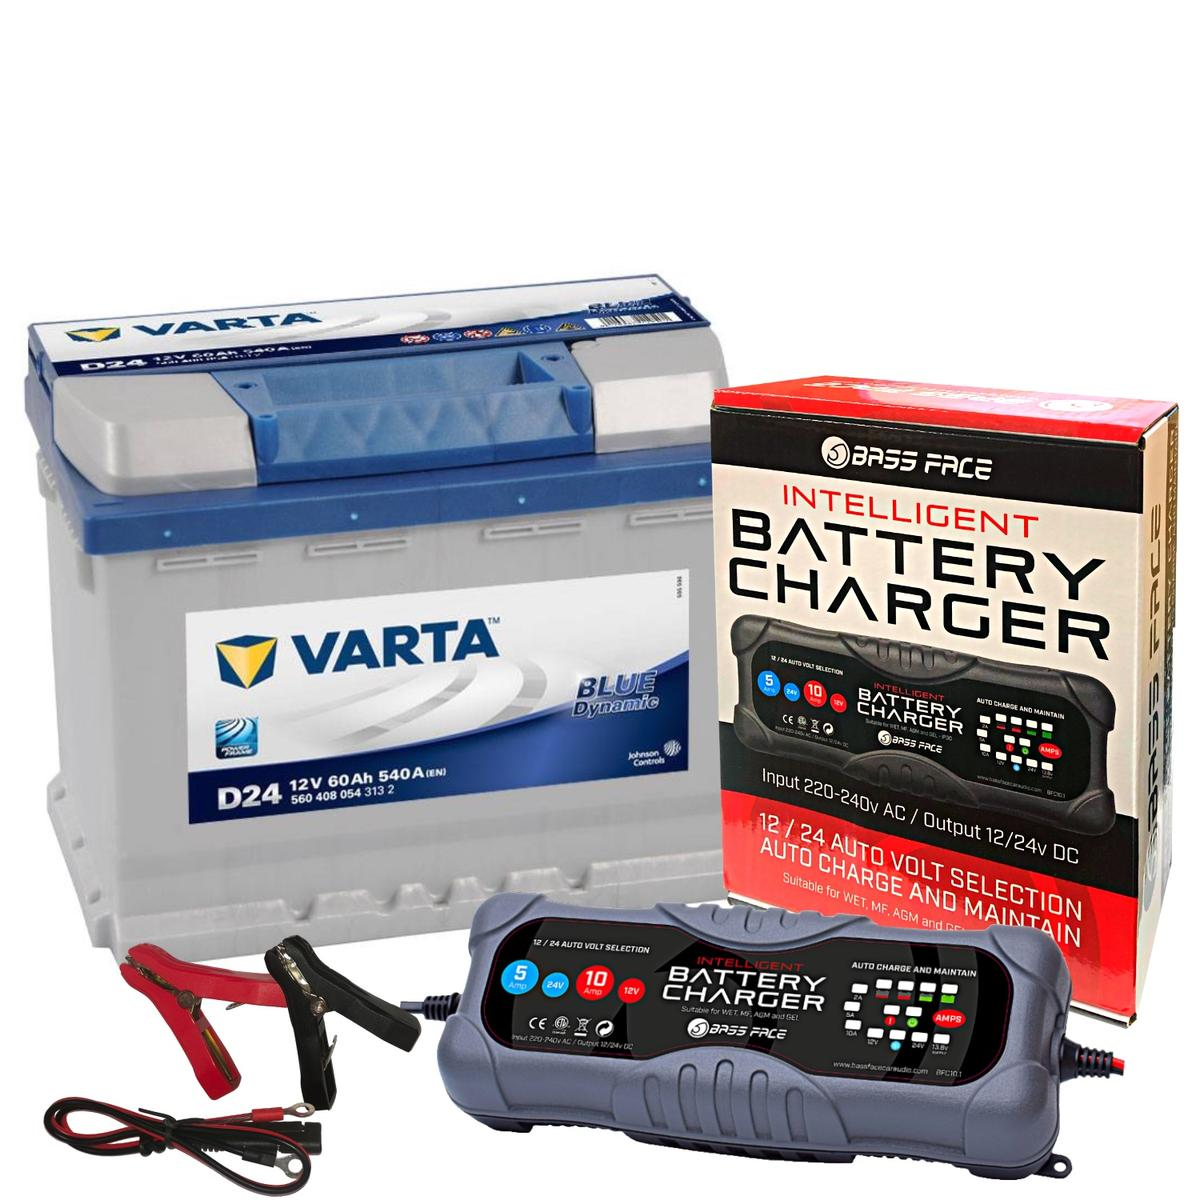 Varta D24 Audi Merc Car Battery 12v 4 Year 027 60Ah 540CCA W/ 10 Amp Charger